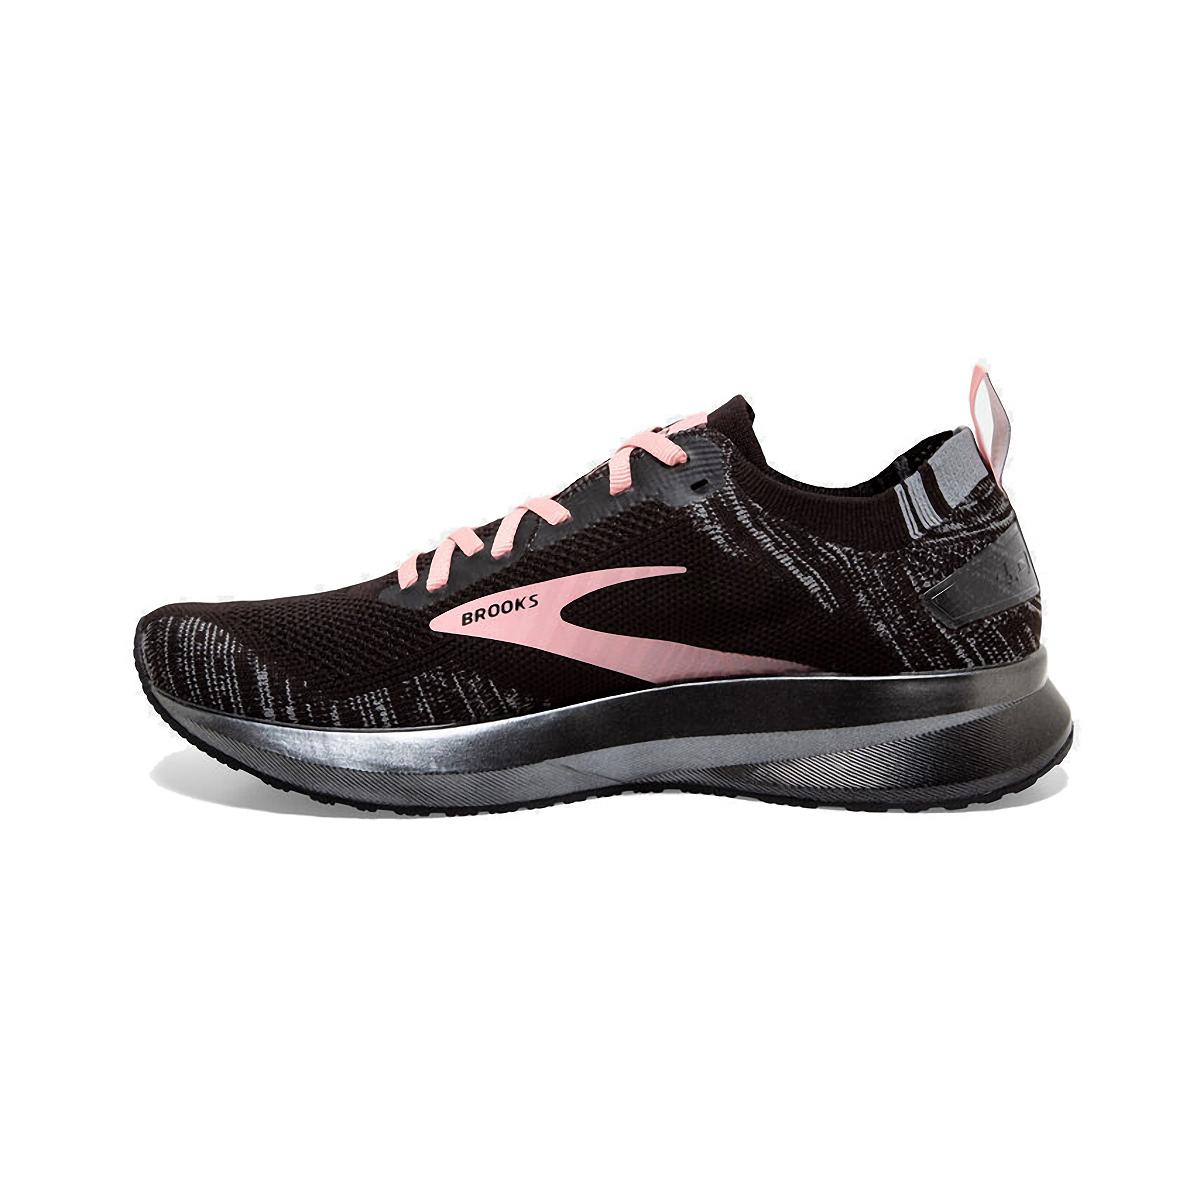 Women's Brooks Levitate 4 Running Shoe - Color: Black/Grey/Coral - Size: 5 - Width: Regular, Black/Grey/Coral, large, image 2